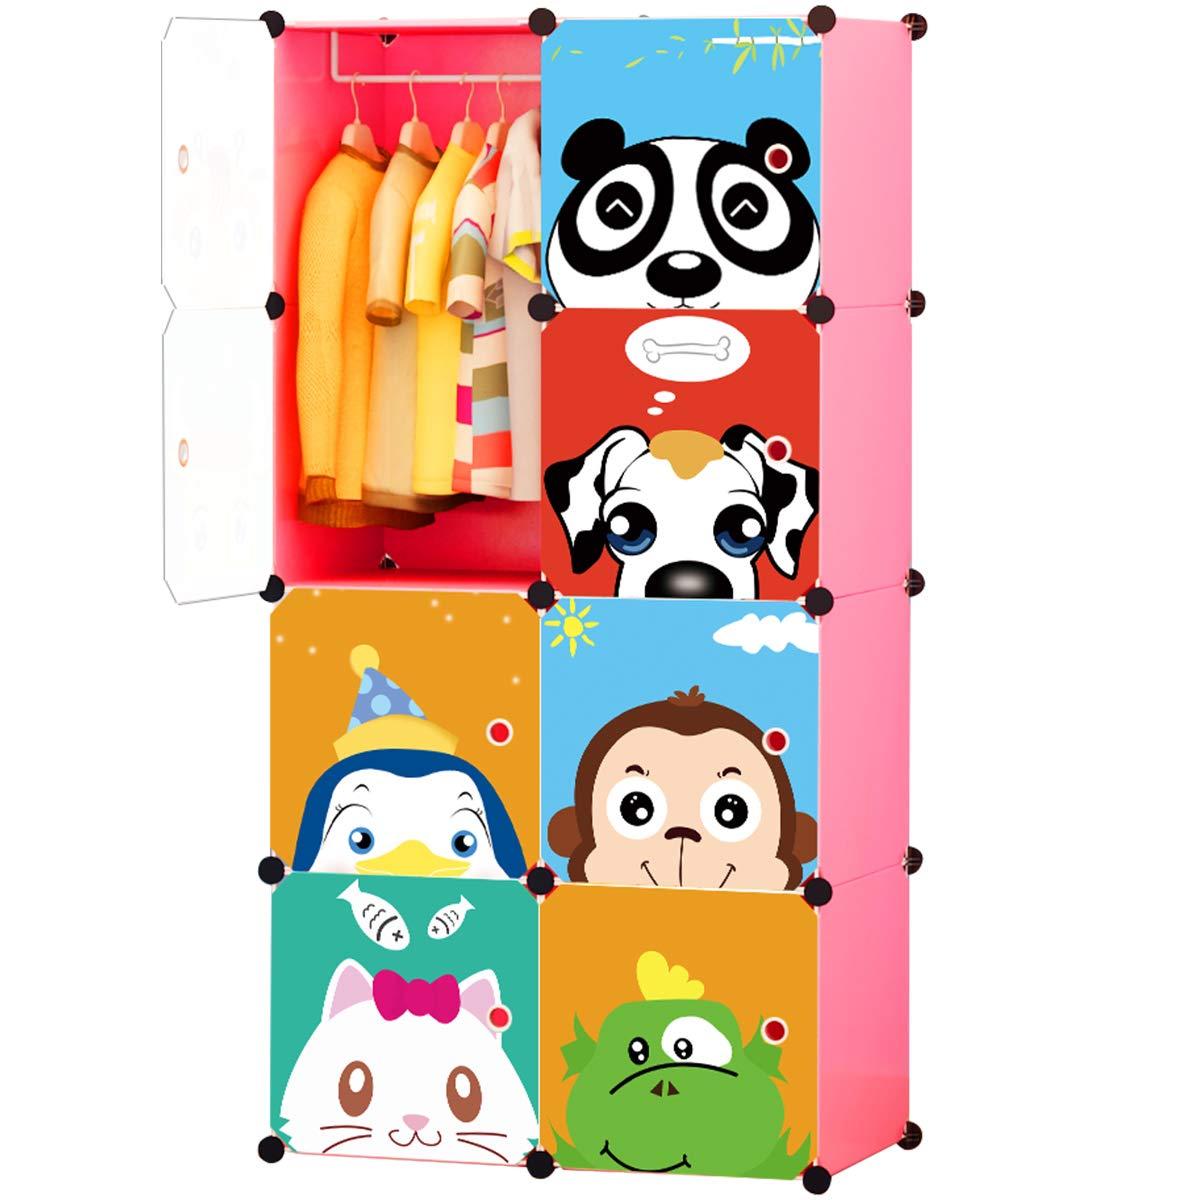 KOUSI Portable Kids Wardrobe Closet Children Dresser Hanging Storage Rack Clothes Closet Bedroom Armoire Cube Organizer Formaldehyde-Free Furniture, Blue, 6 Cubes&1 Hanging Section